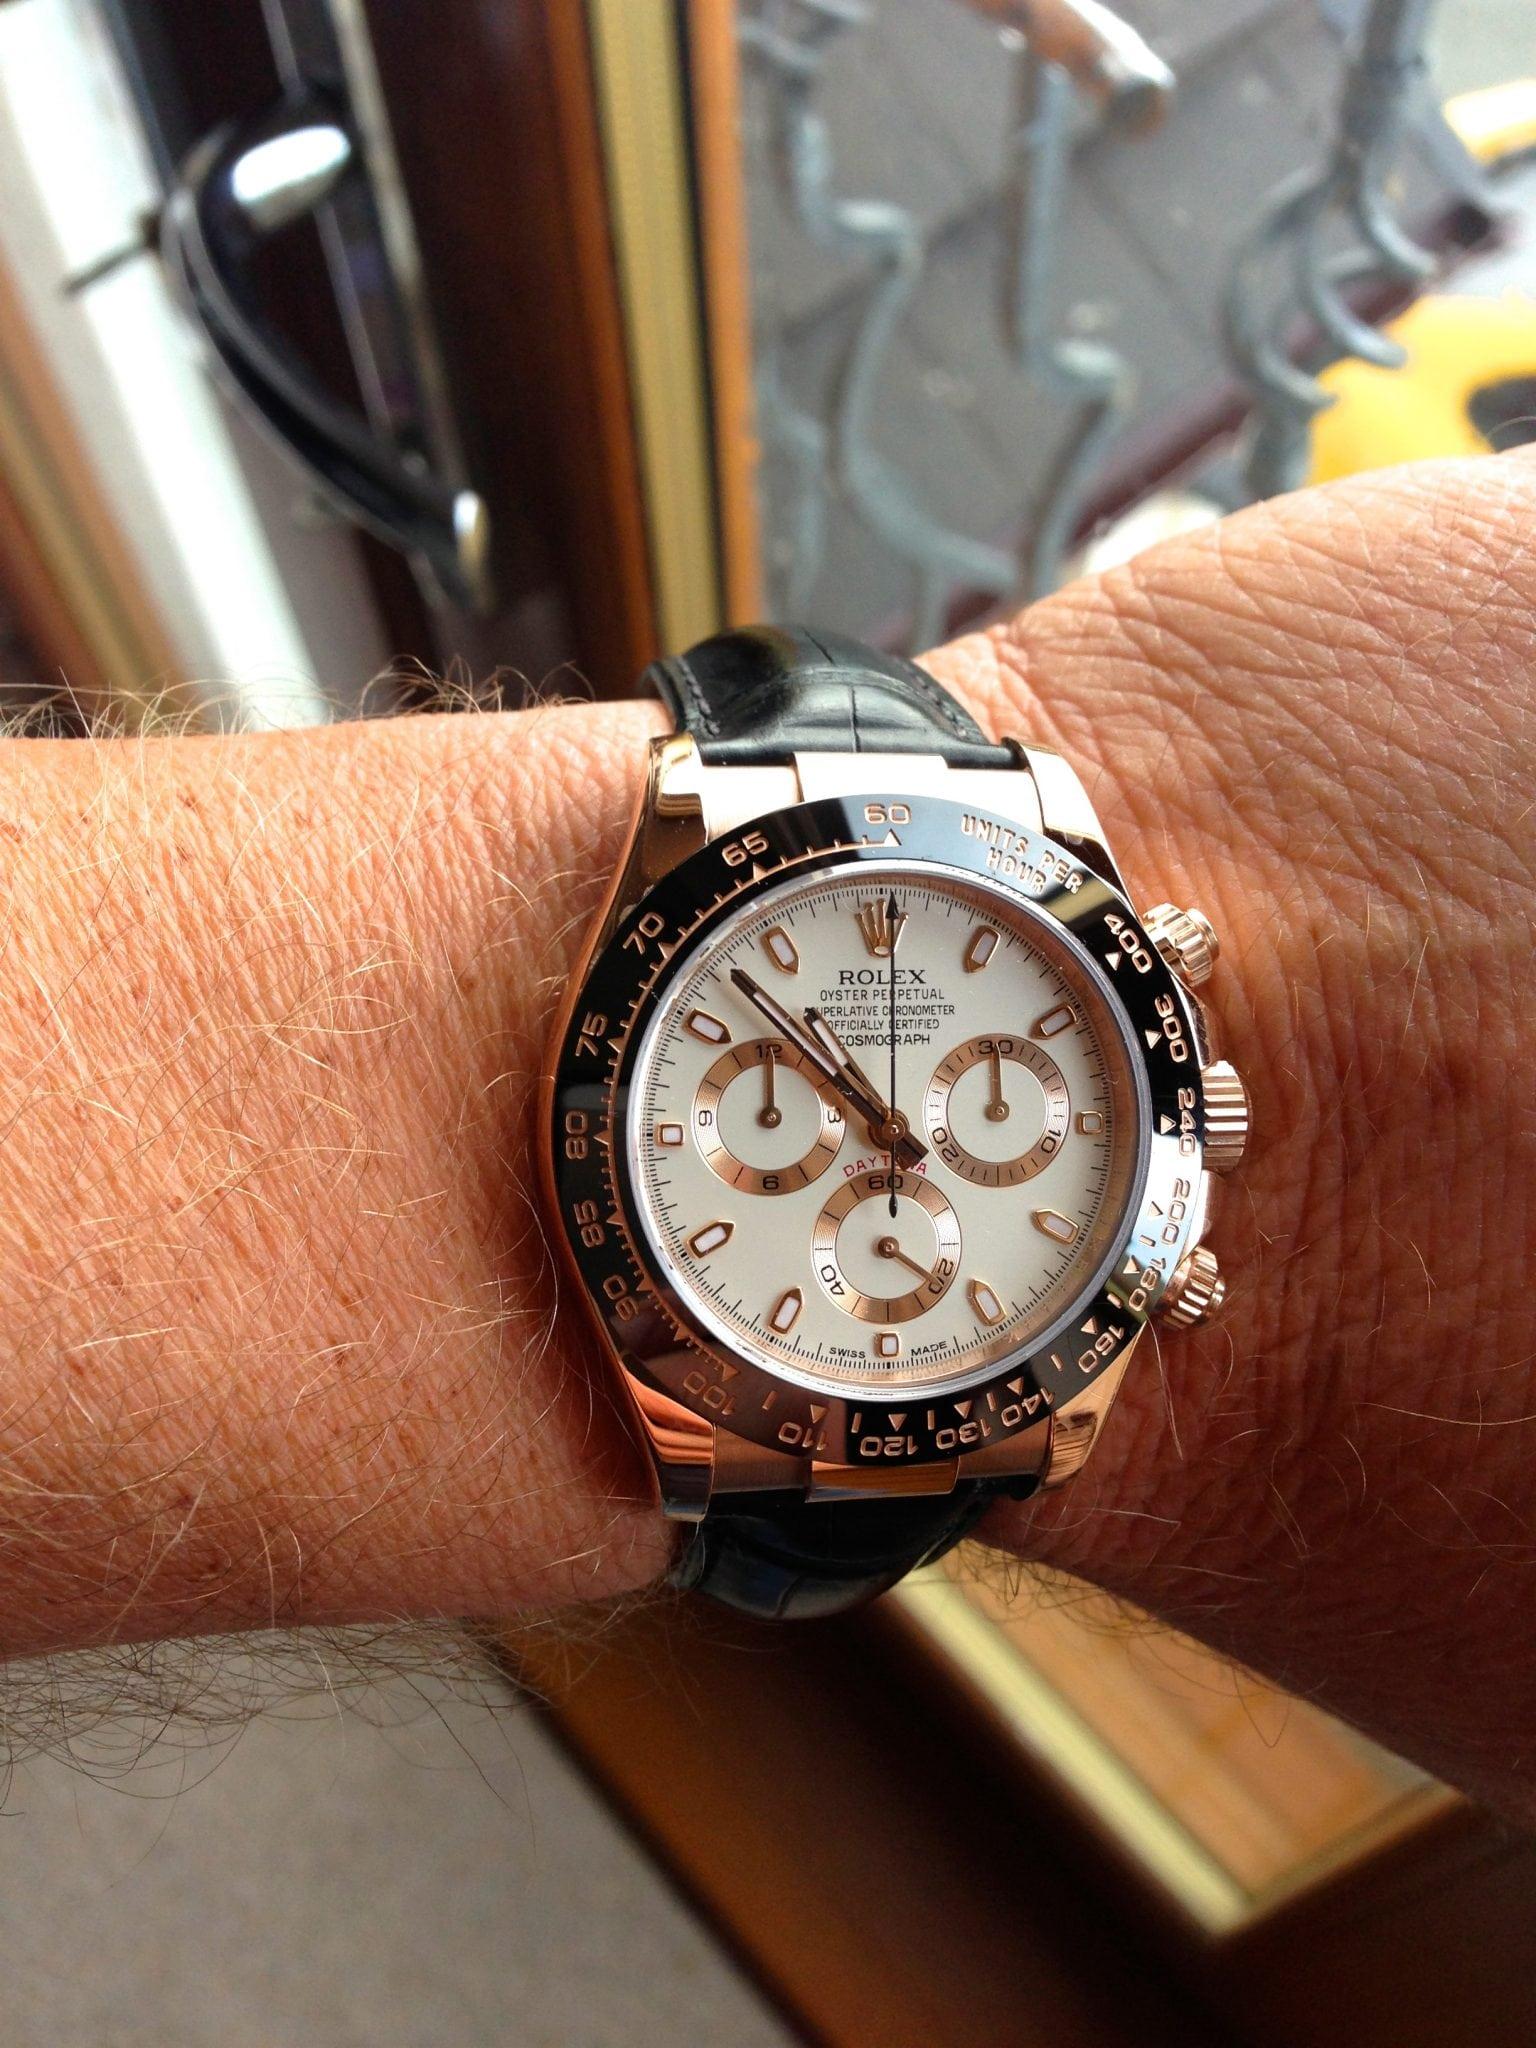 Rolex Daytona Rose Gold Ceramic Ref 116515ln Uk Specialist Watches